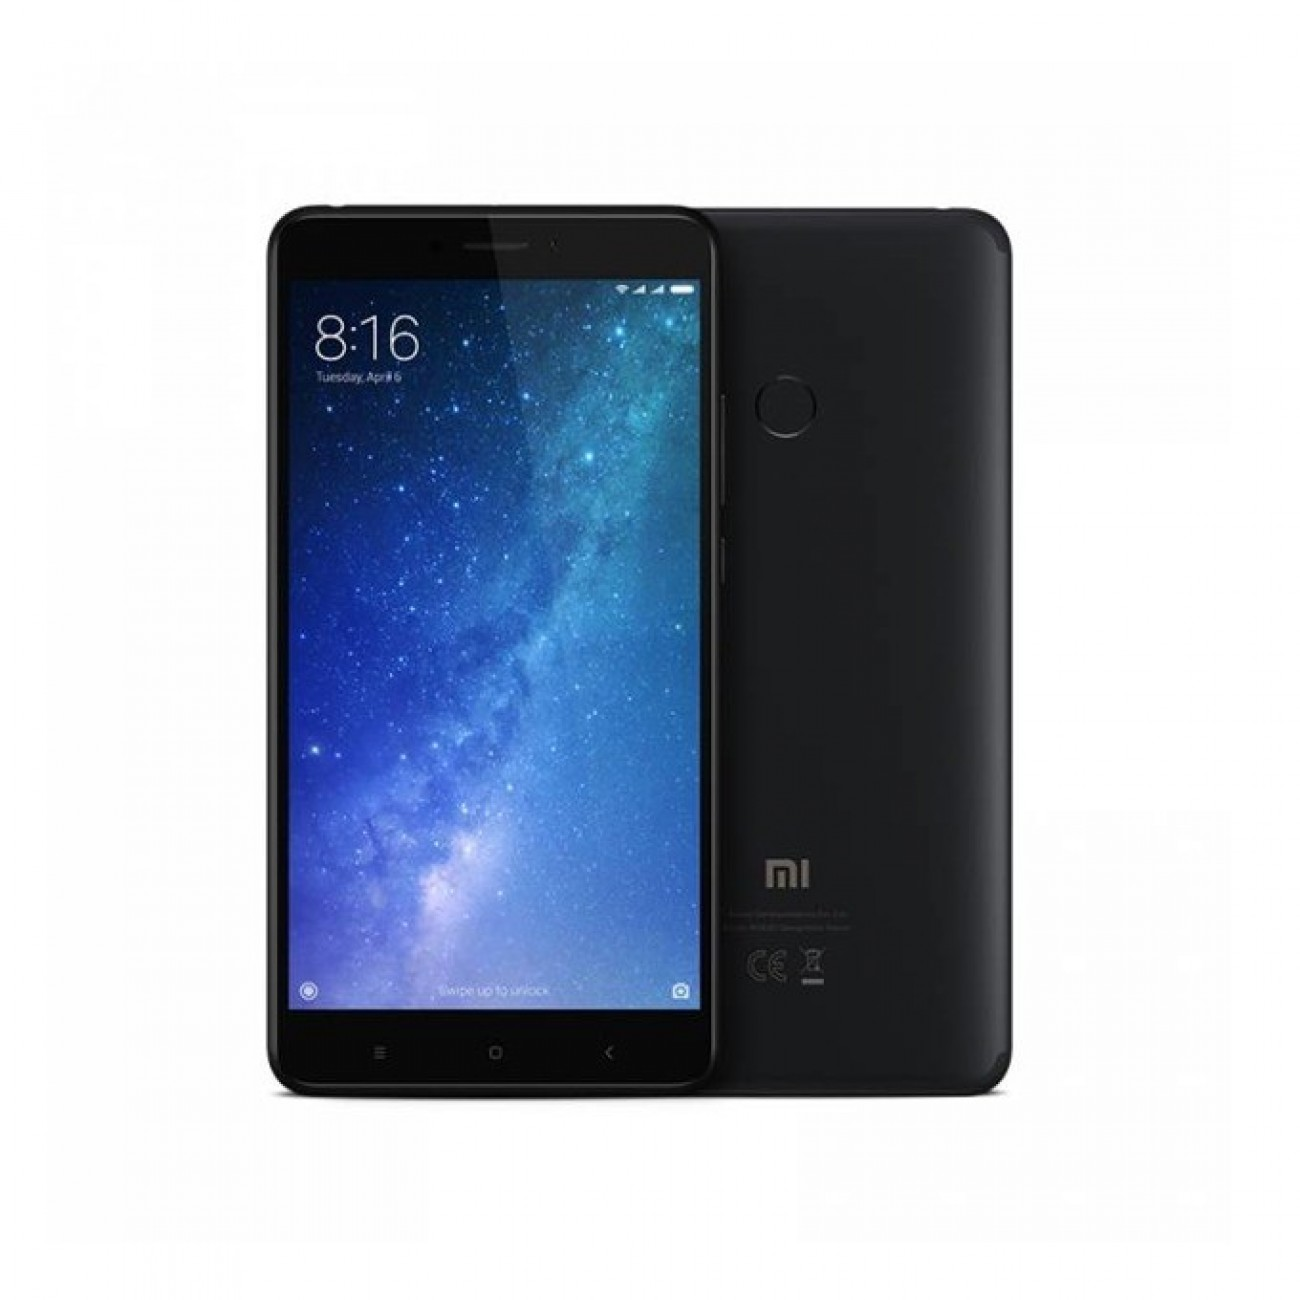 Xiaomi Mi Max 2 (черен), 6.44 (16.35 cm) Full HD, осемядрен Qualcomm MSM8953 Snapdragon 625 (2.0 GHz Cortex-A53), 4GB RAM, 64GB Flash памет(+microSD слот), 12 & 5 Mpix camera, Android, 211g в Мобилни телефони - Xiaomi | Alleop